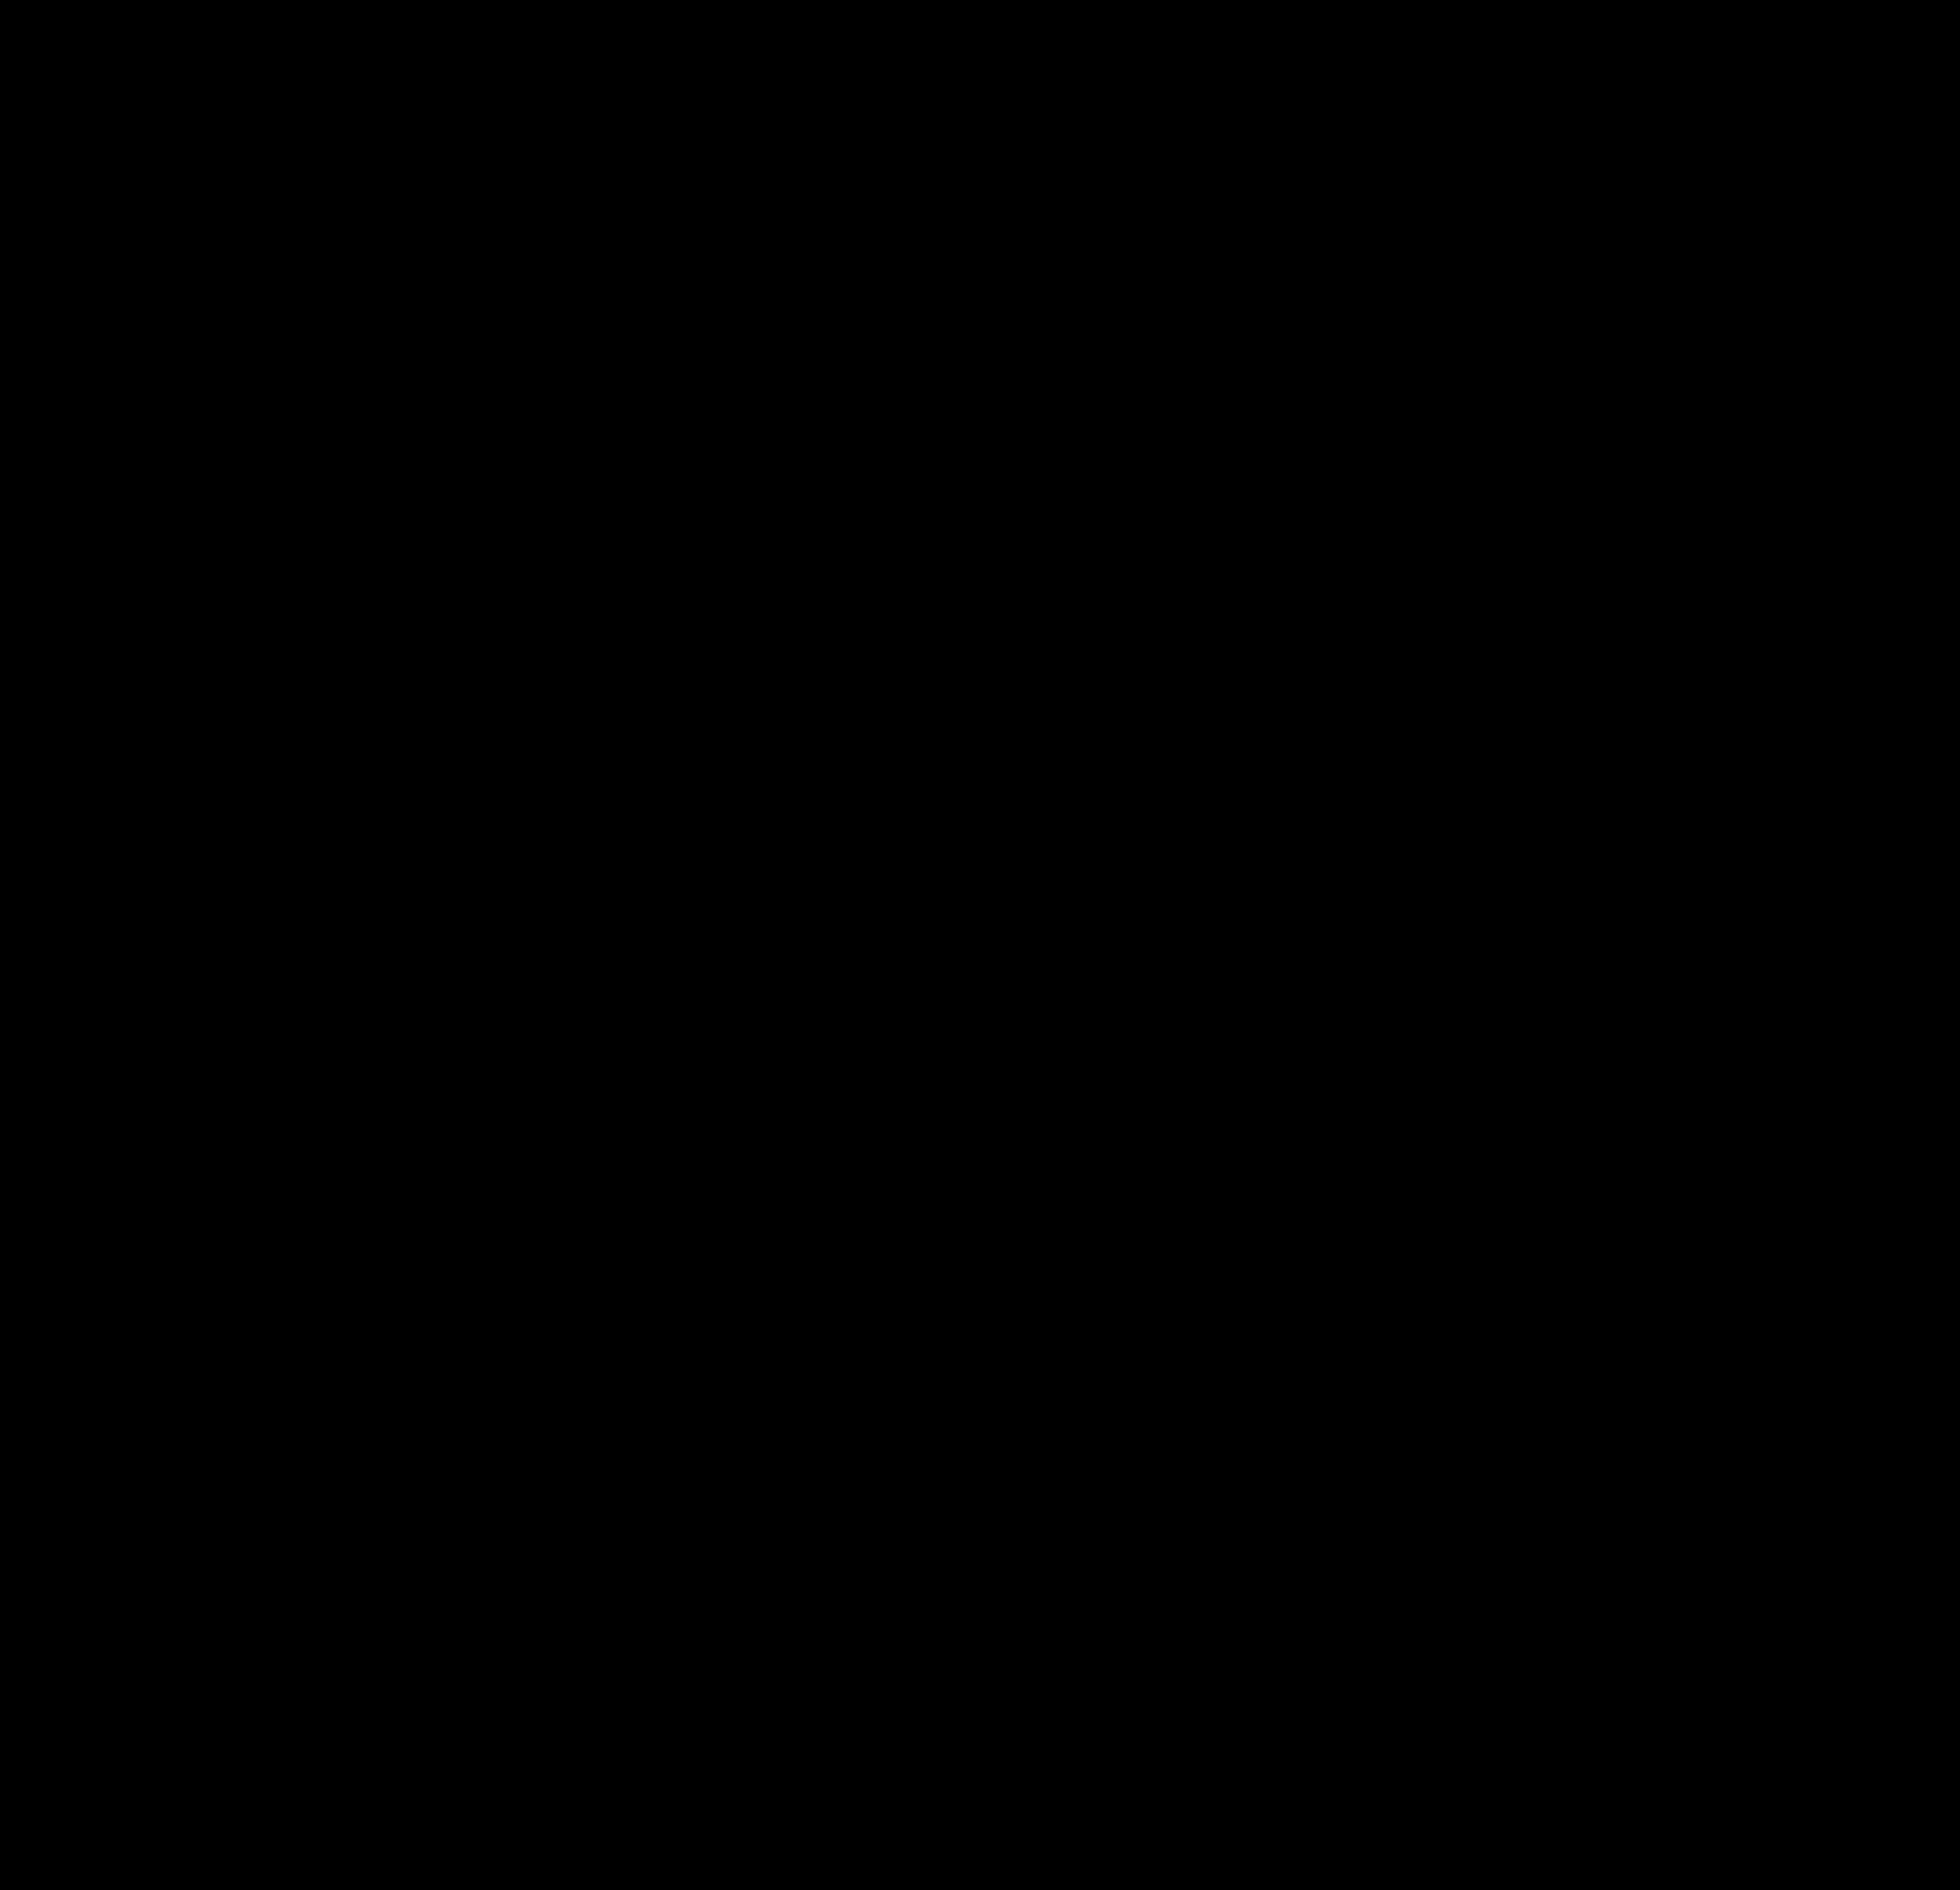 0x0-Tesla_T_Black